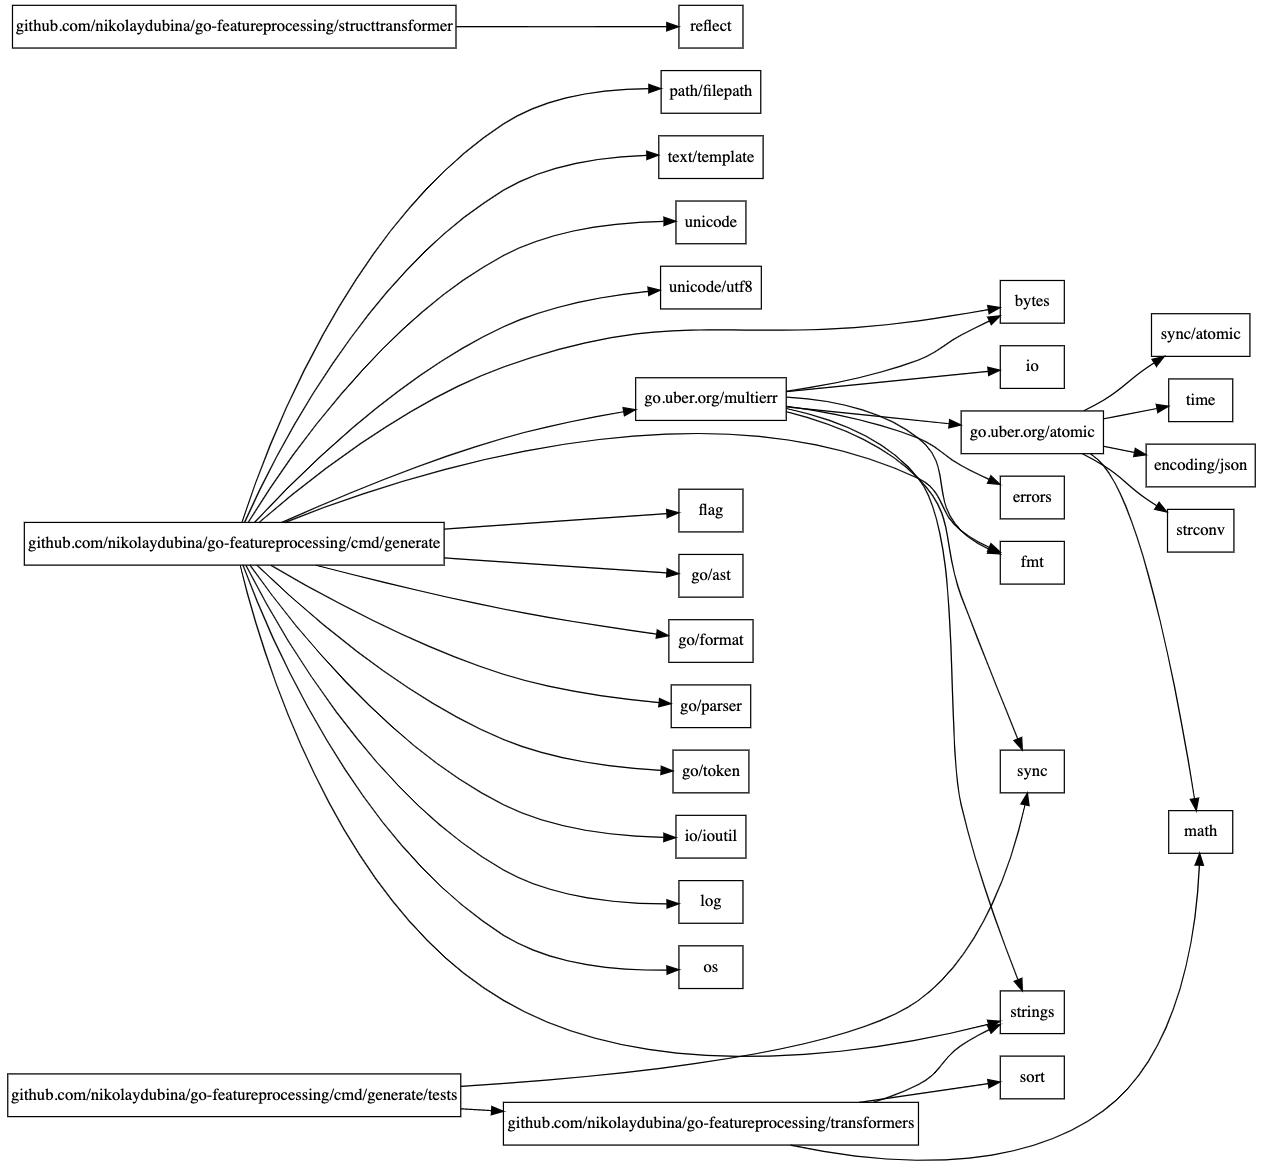 AI 预测蛋白质结构「GitHub 热点速览 v.21.29」